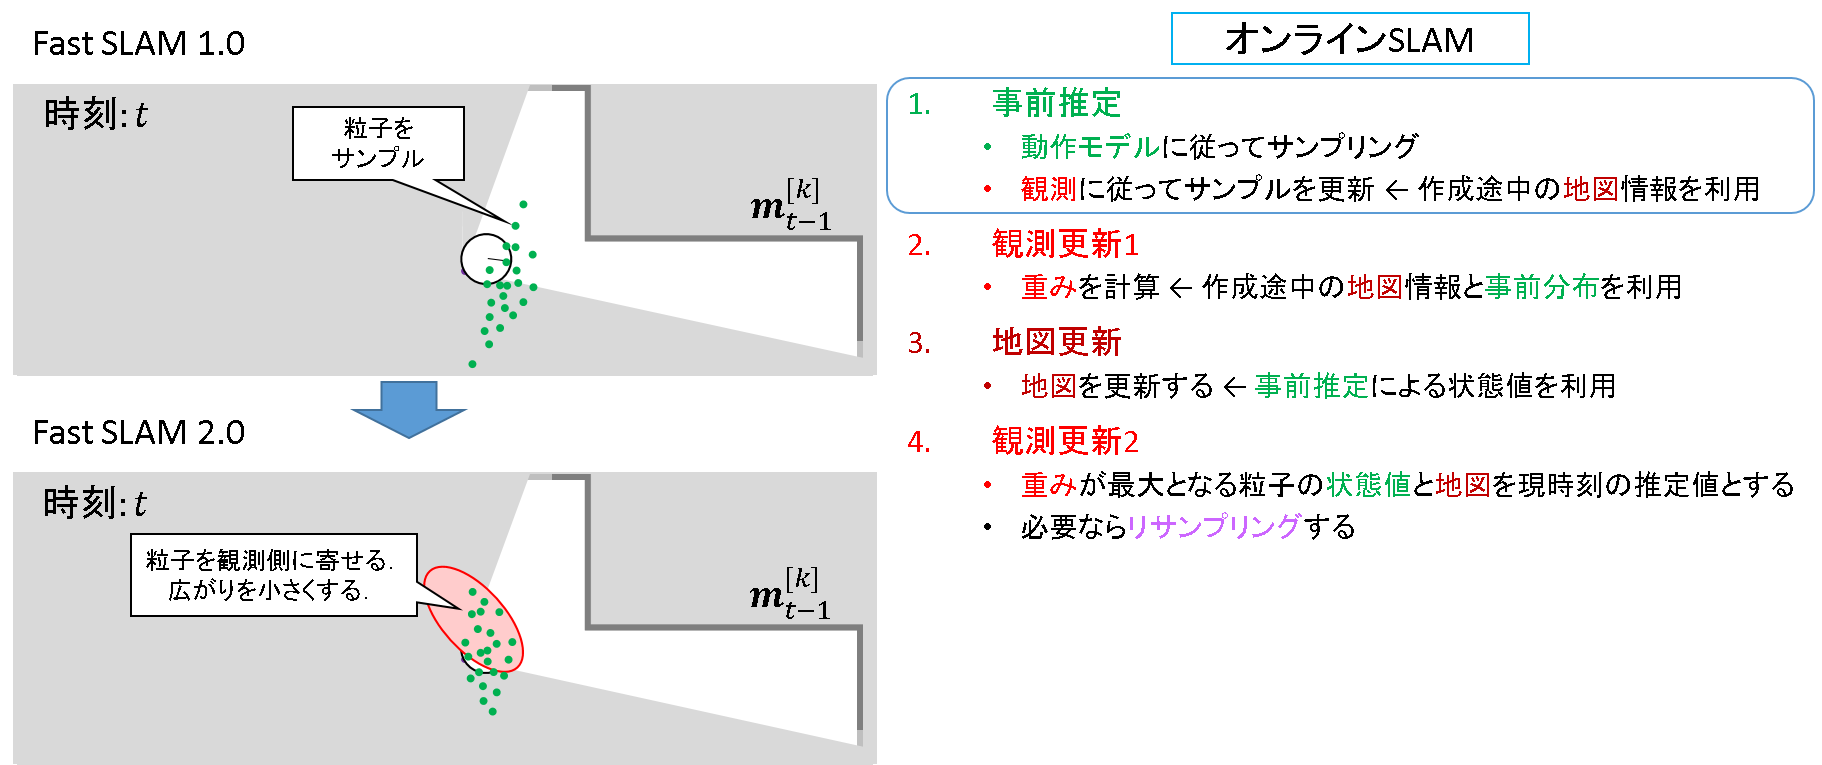 77_FastSLAM2.0_事前推定.png